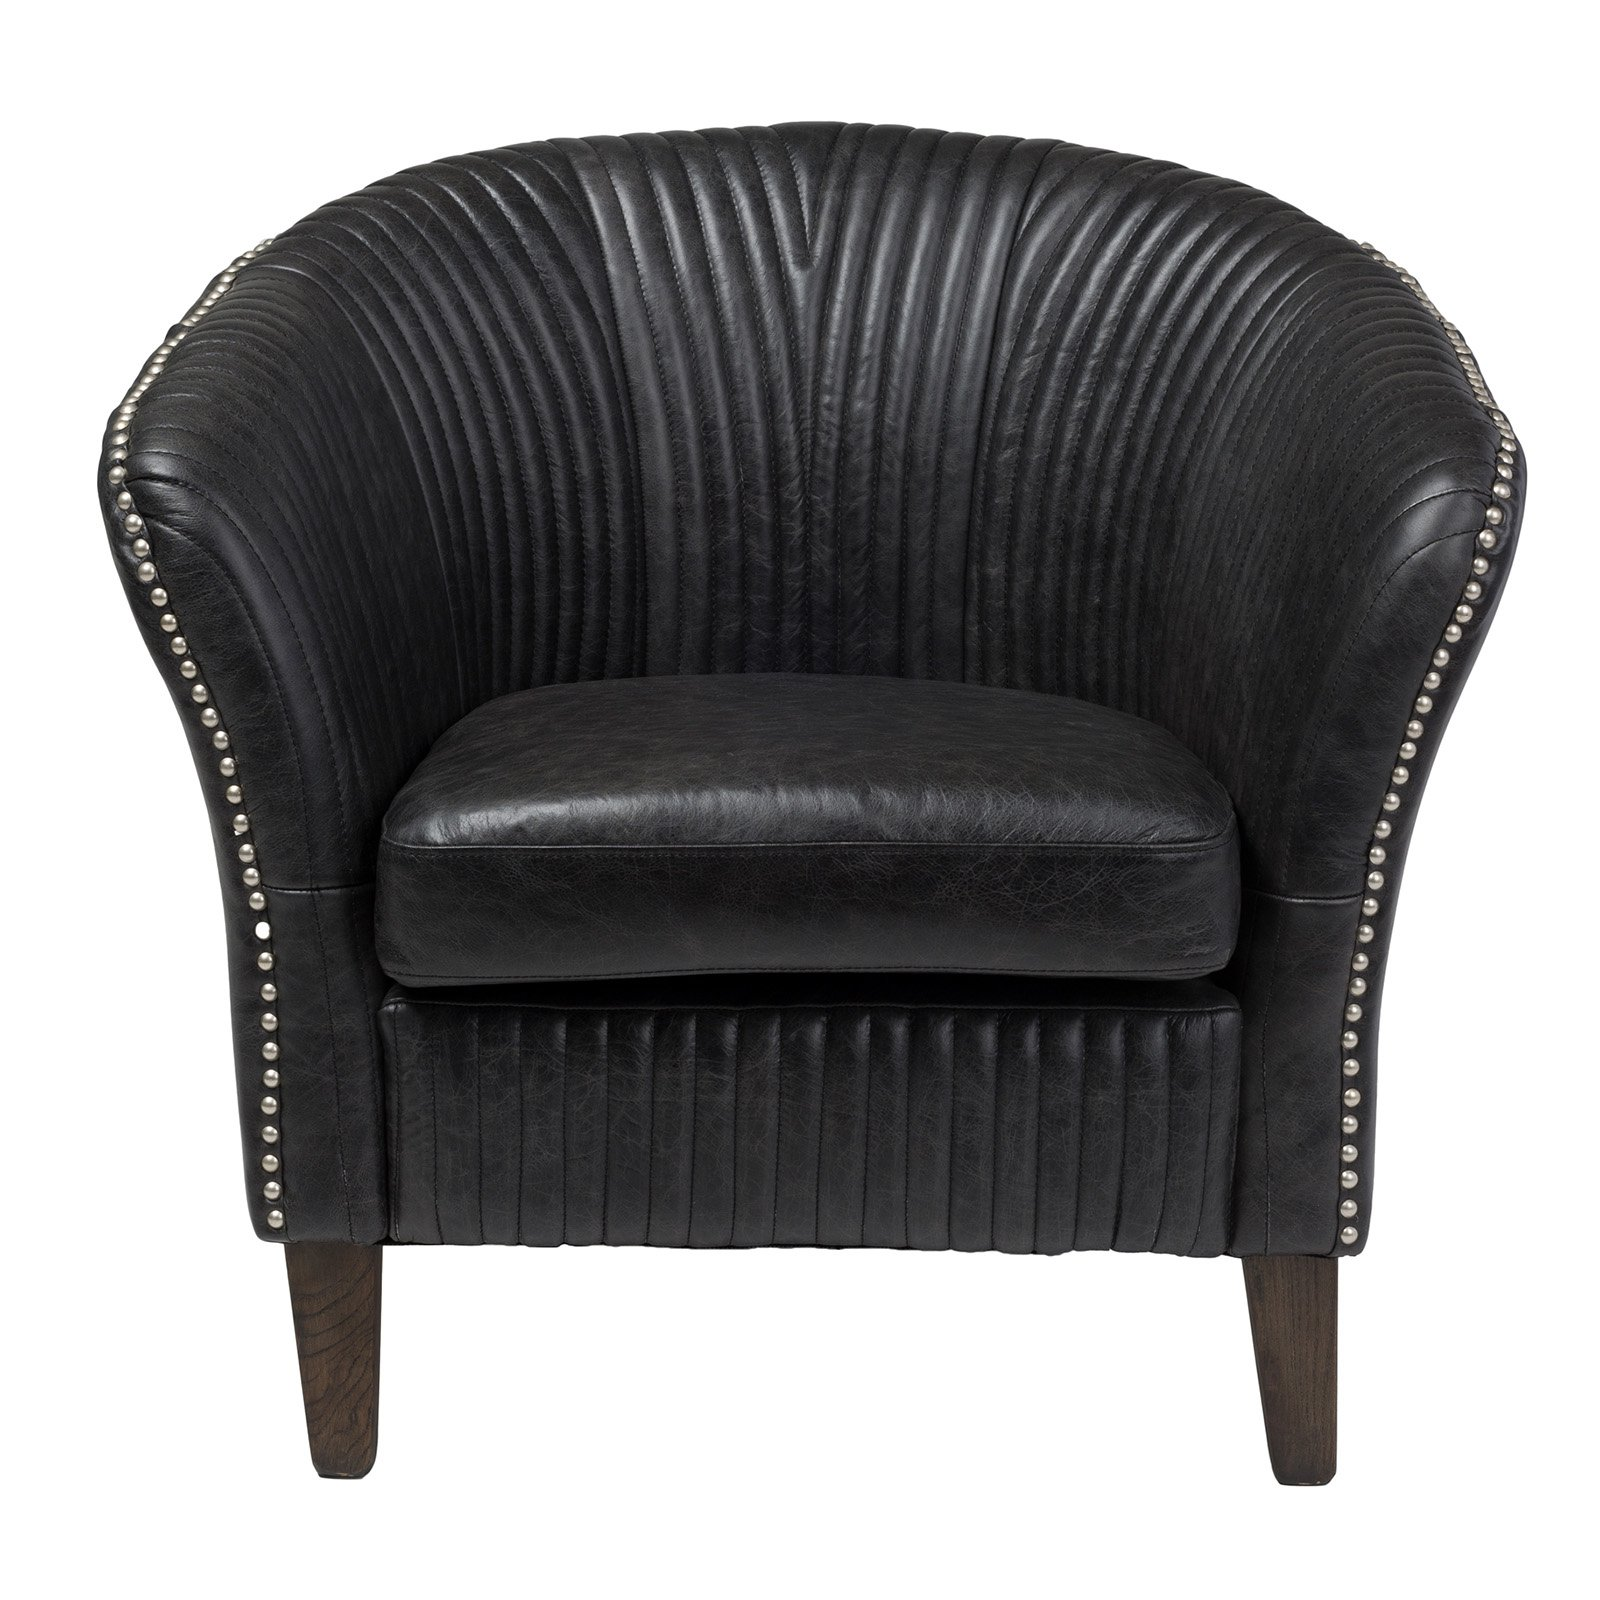 Lambert Barrel Chair with Nailhead Trim